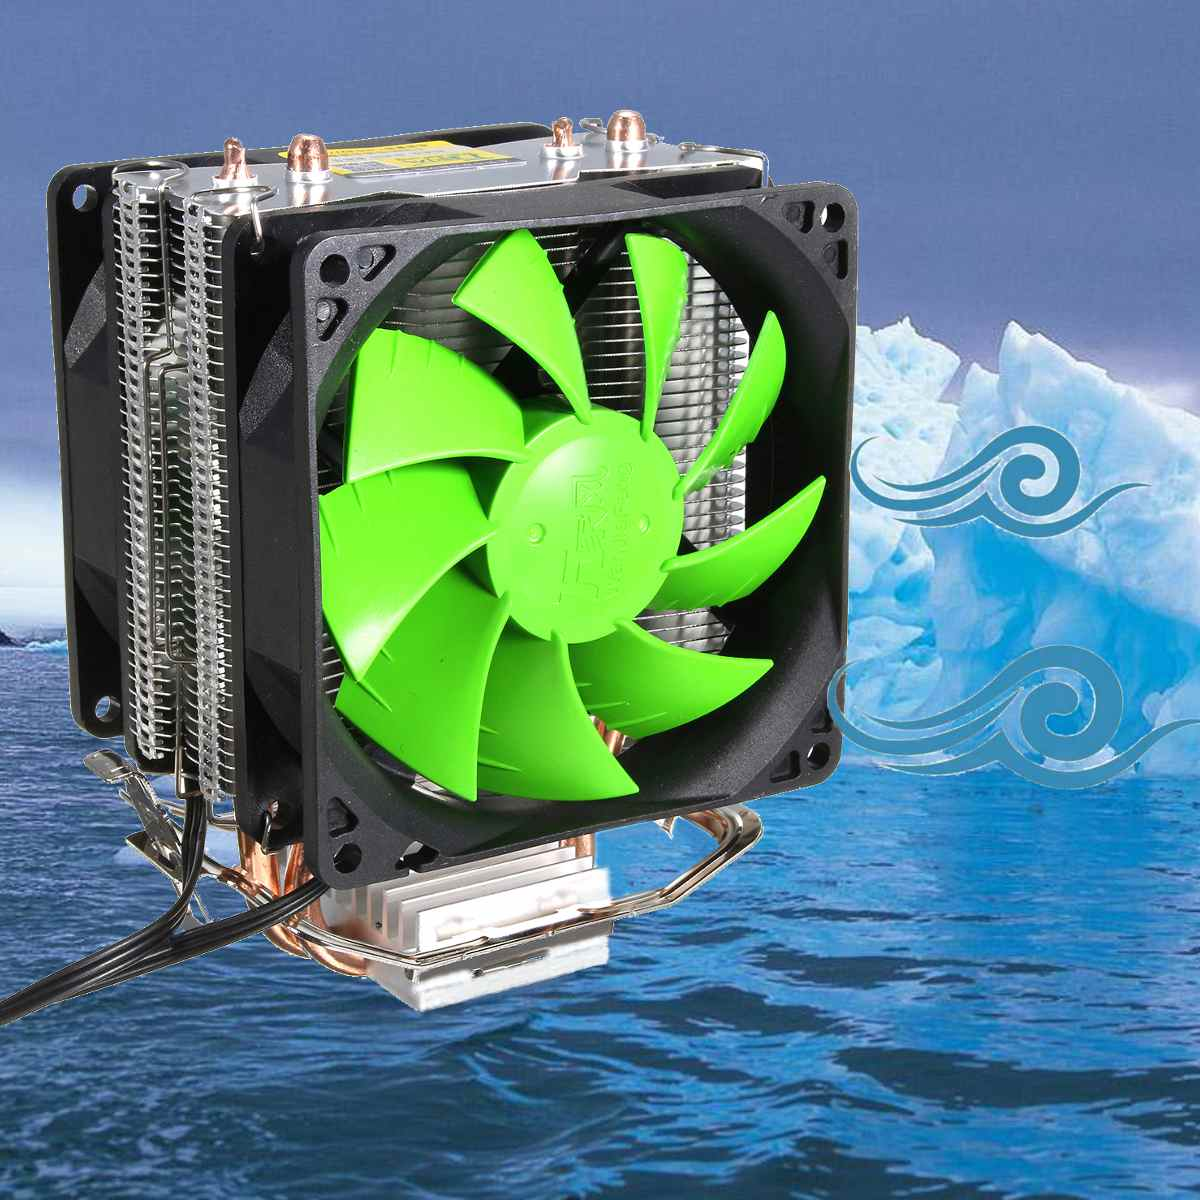 Radiador disipador de calor enfriador de CPU de ventilador Dual de 3 pines para Intel LGA775/1156/1155 AMD AM2/AM2 +/AM3 para AM4 Ryzen para Pentium